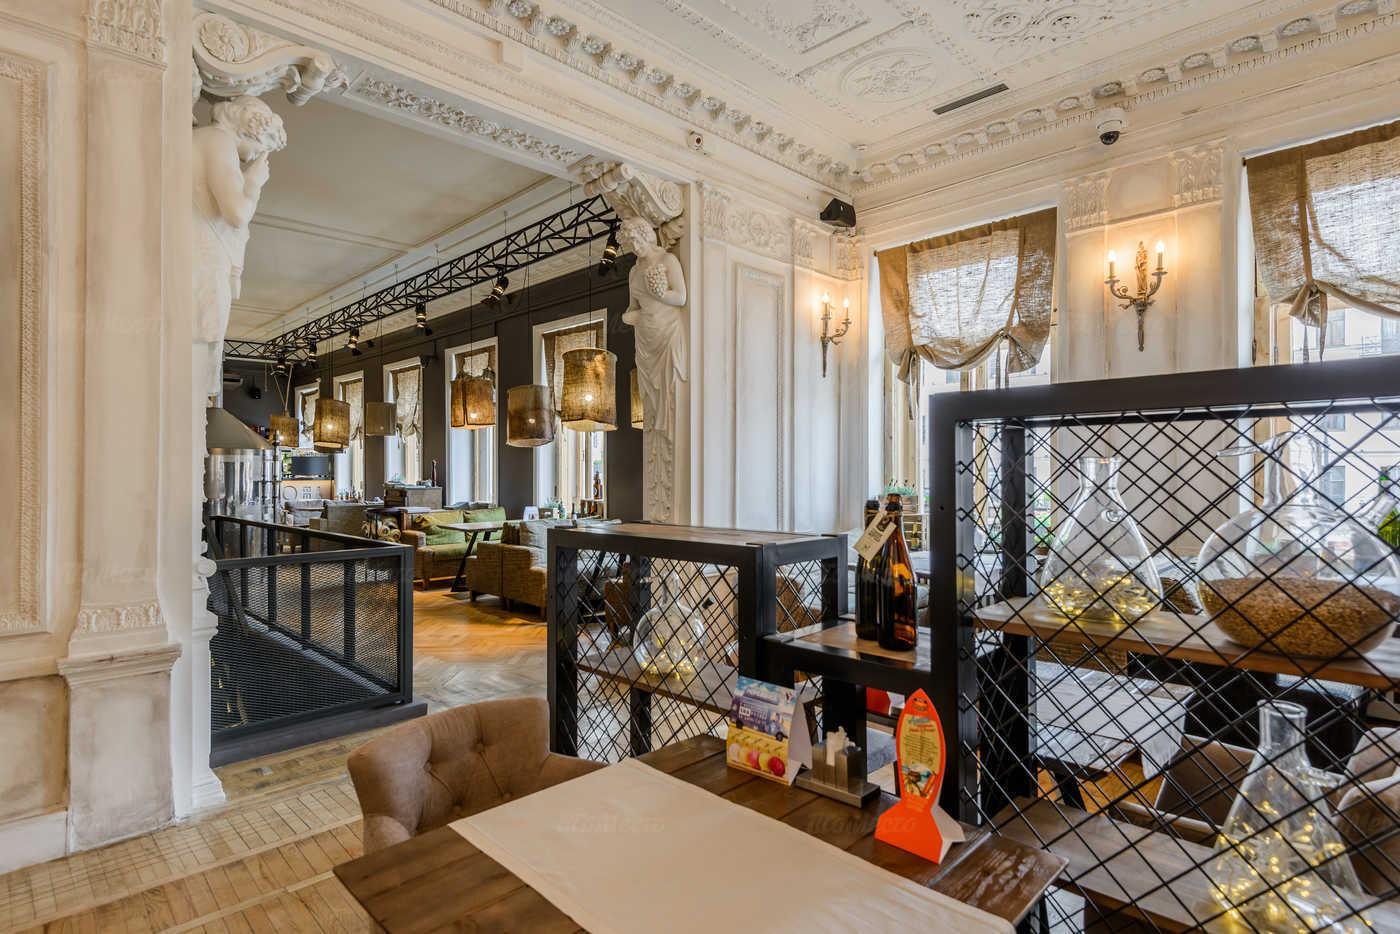 Ресторан Шато Винтаж (Chateau Vintage) на Невском проспекте фото 17